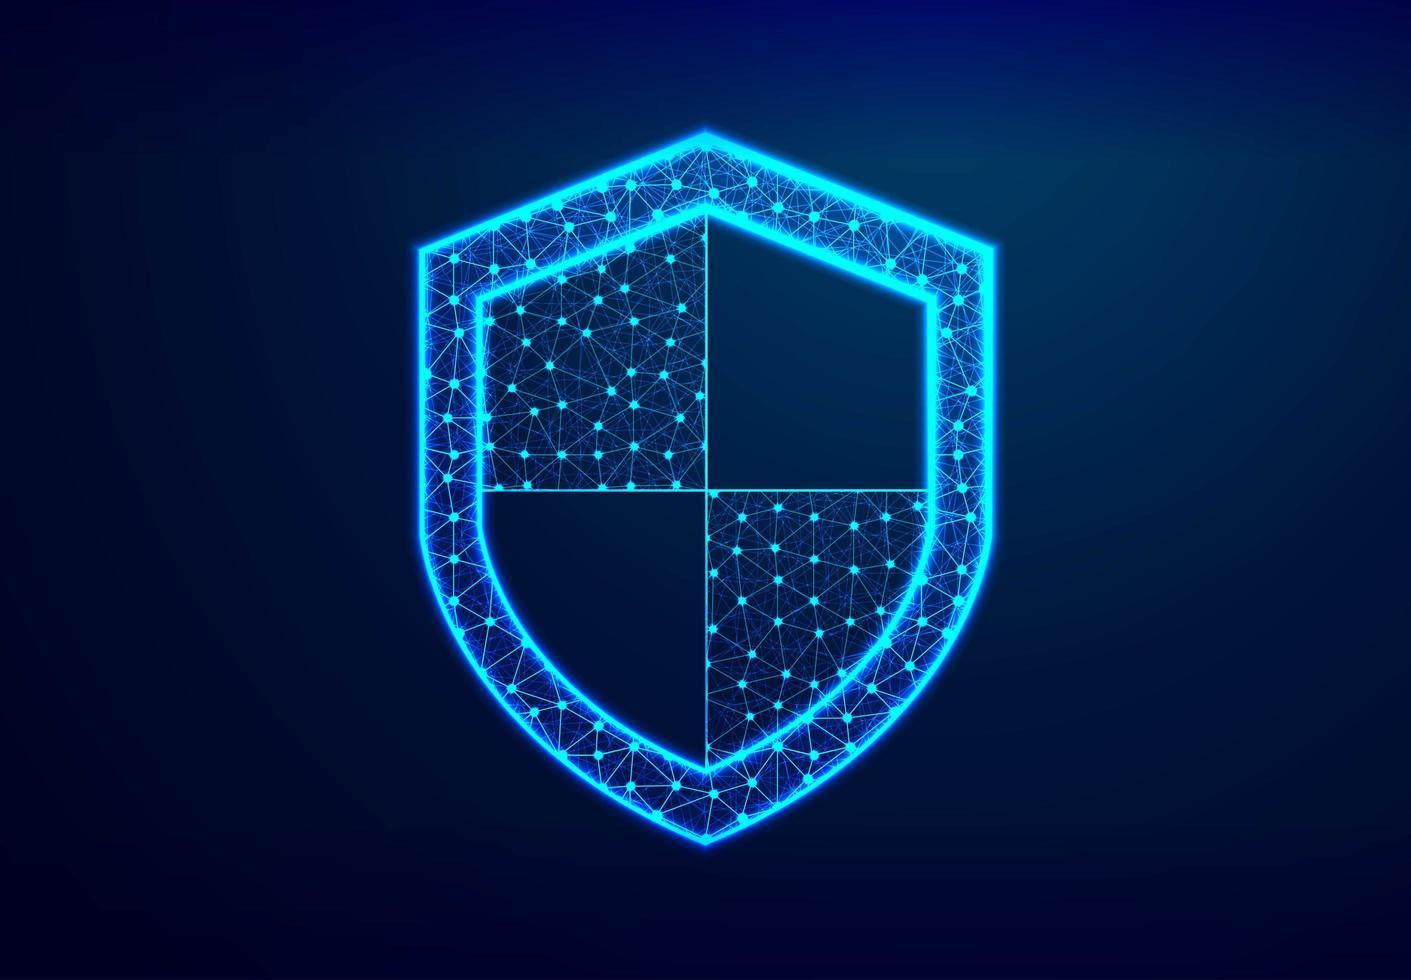 escudo conceito de segurança antídoto crime cibernético na internet vetor